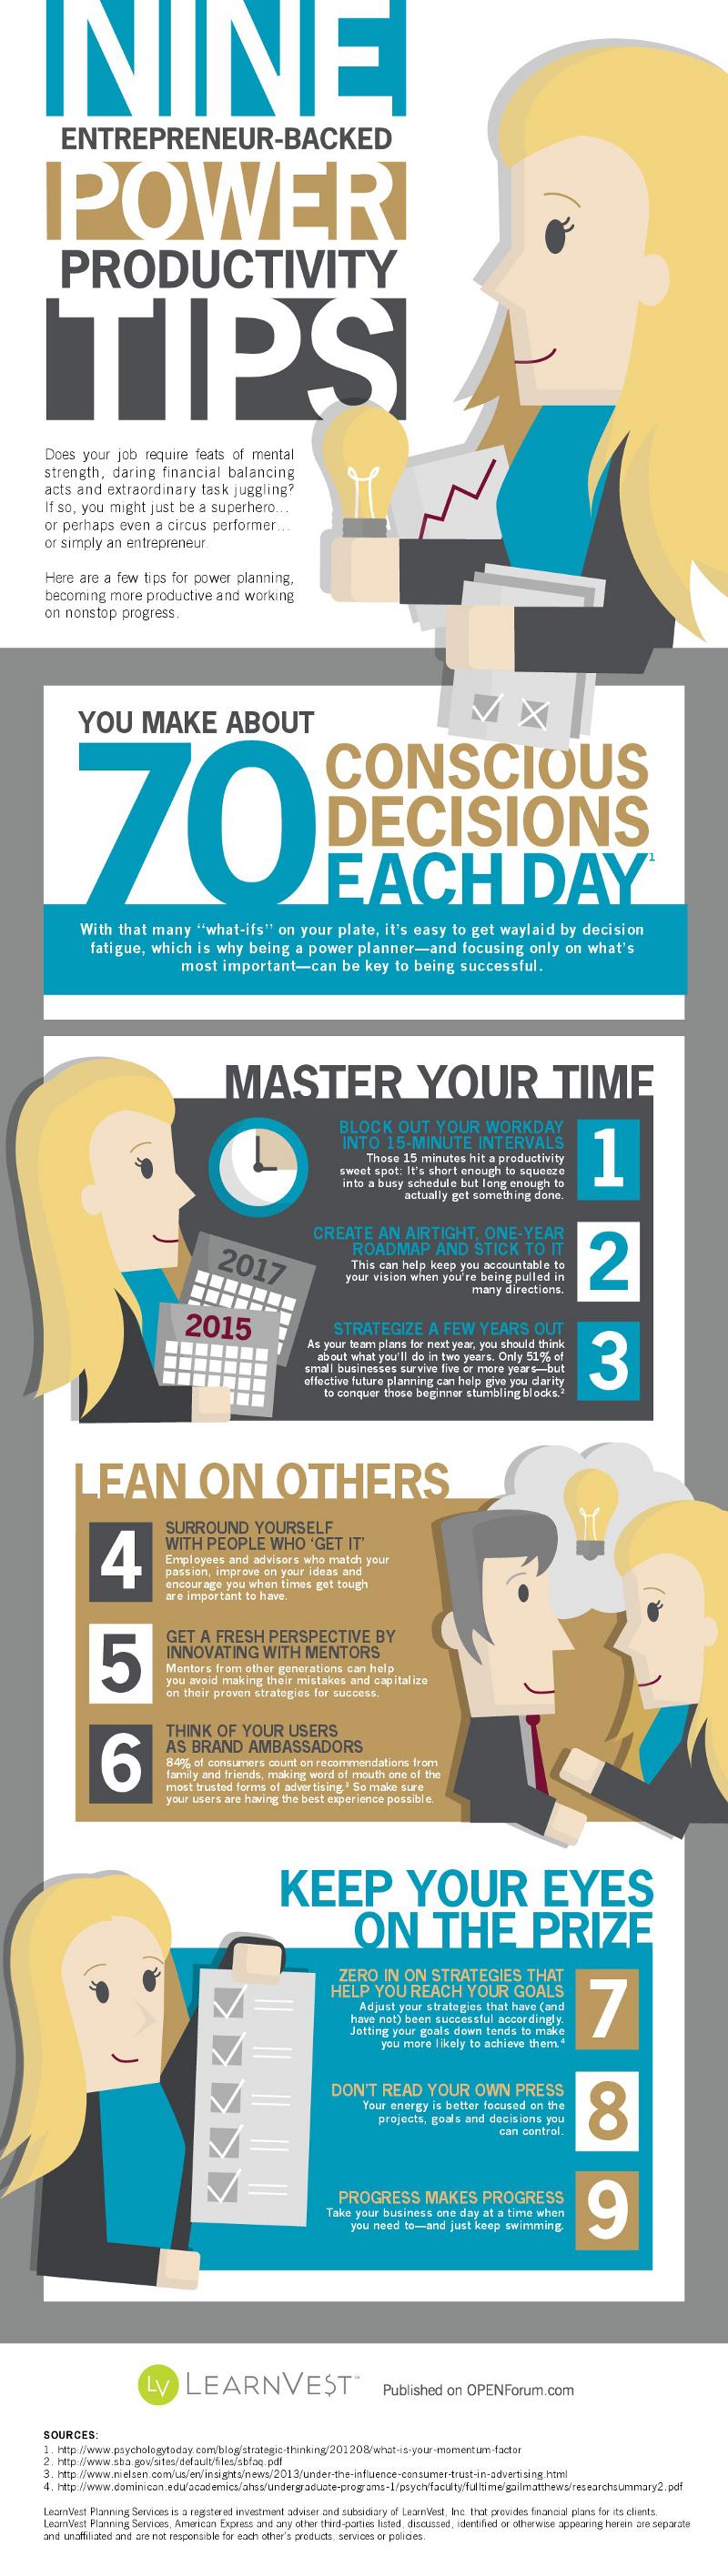 Ways-Entrepreneurs-Supercharge